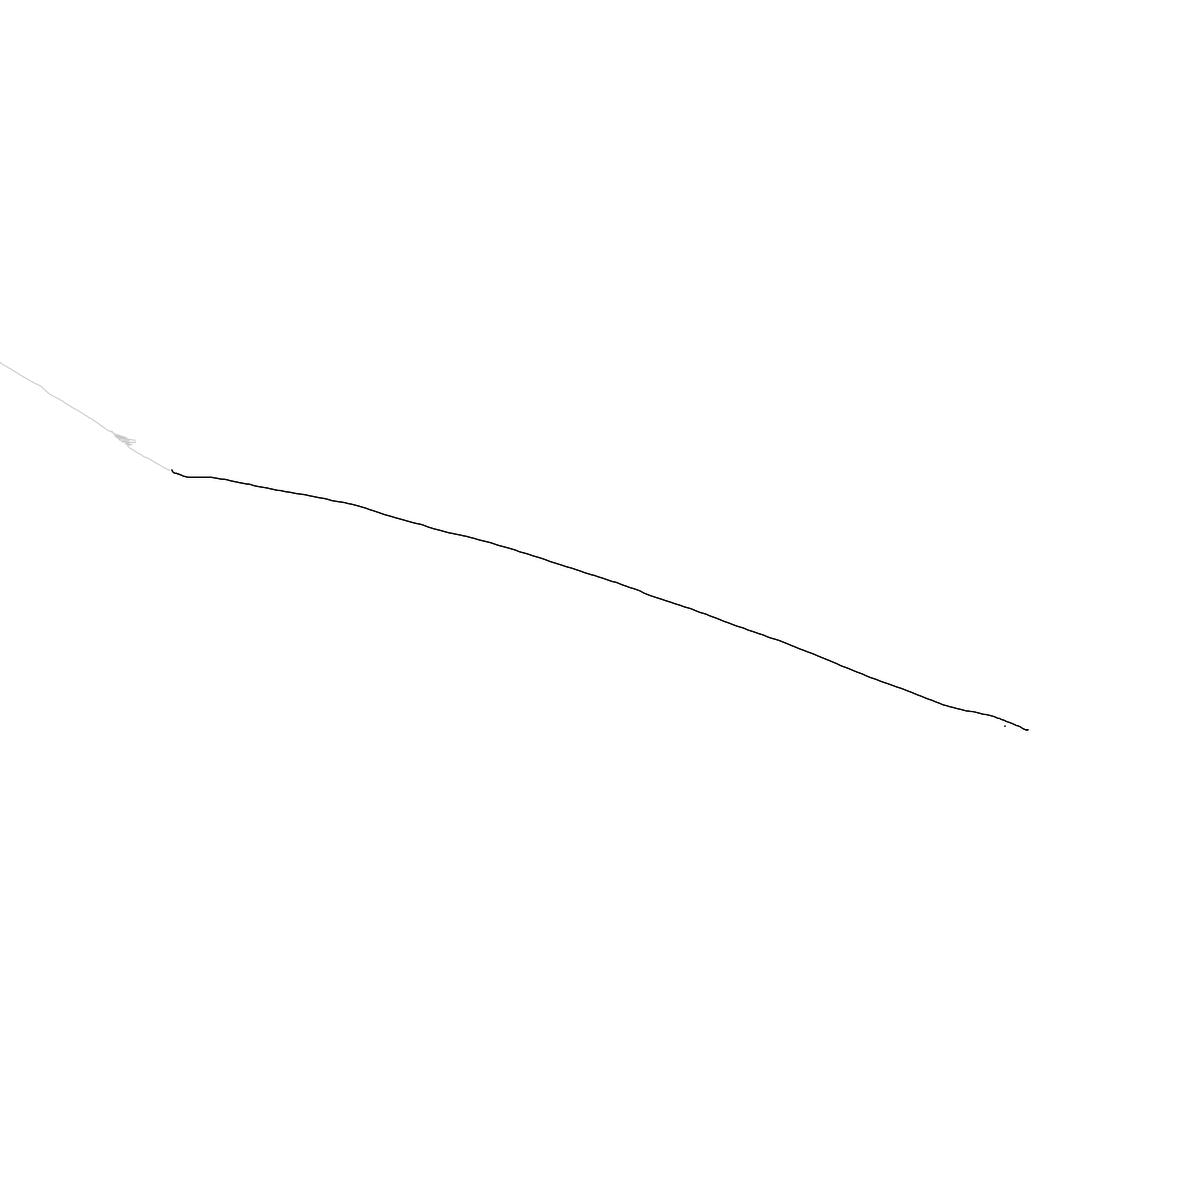 BAAAM drawing#23134 lat:35.7411193847656250lng: 51.3824882507324200